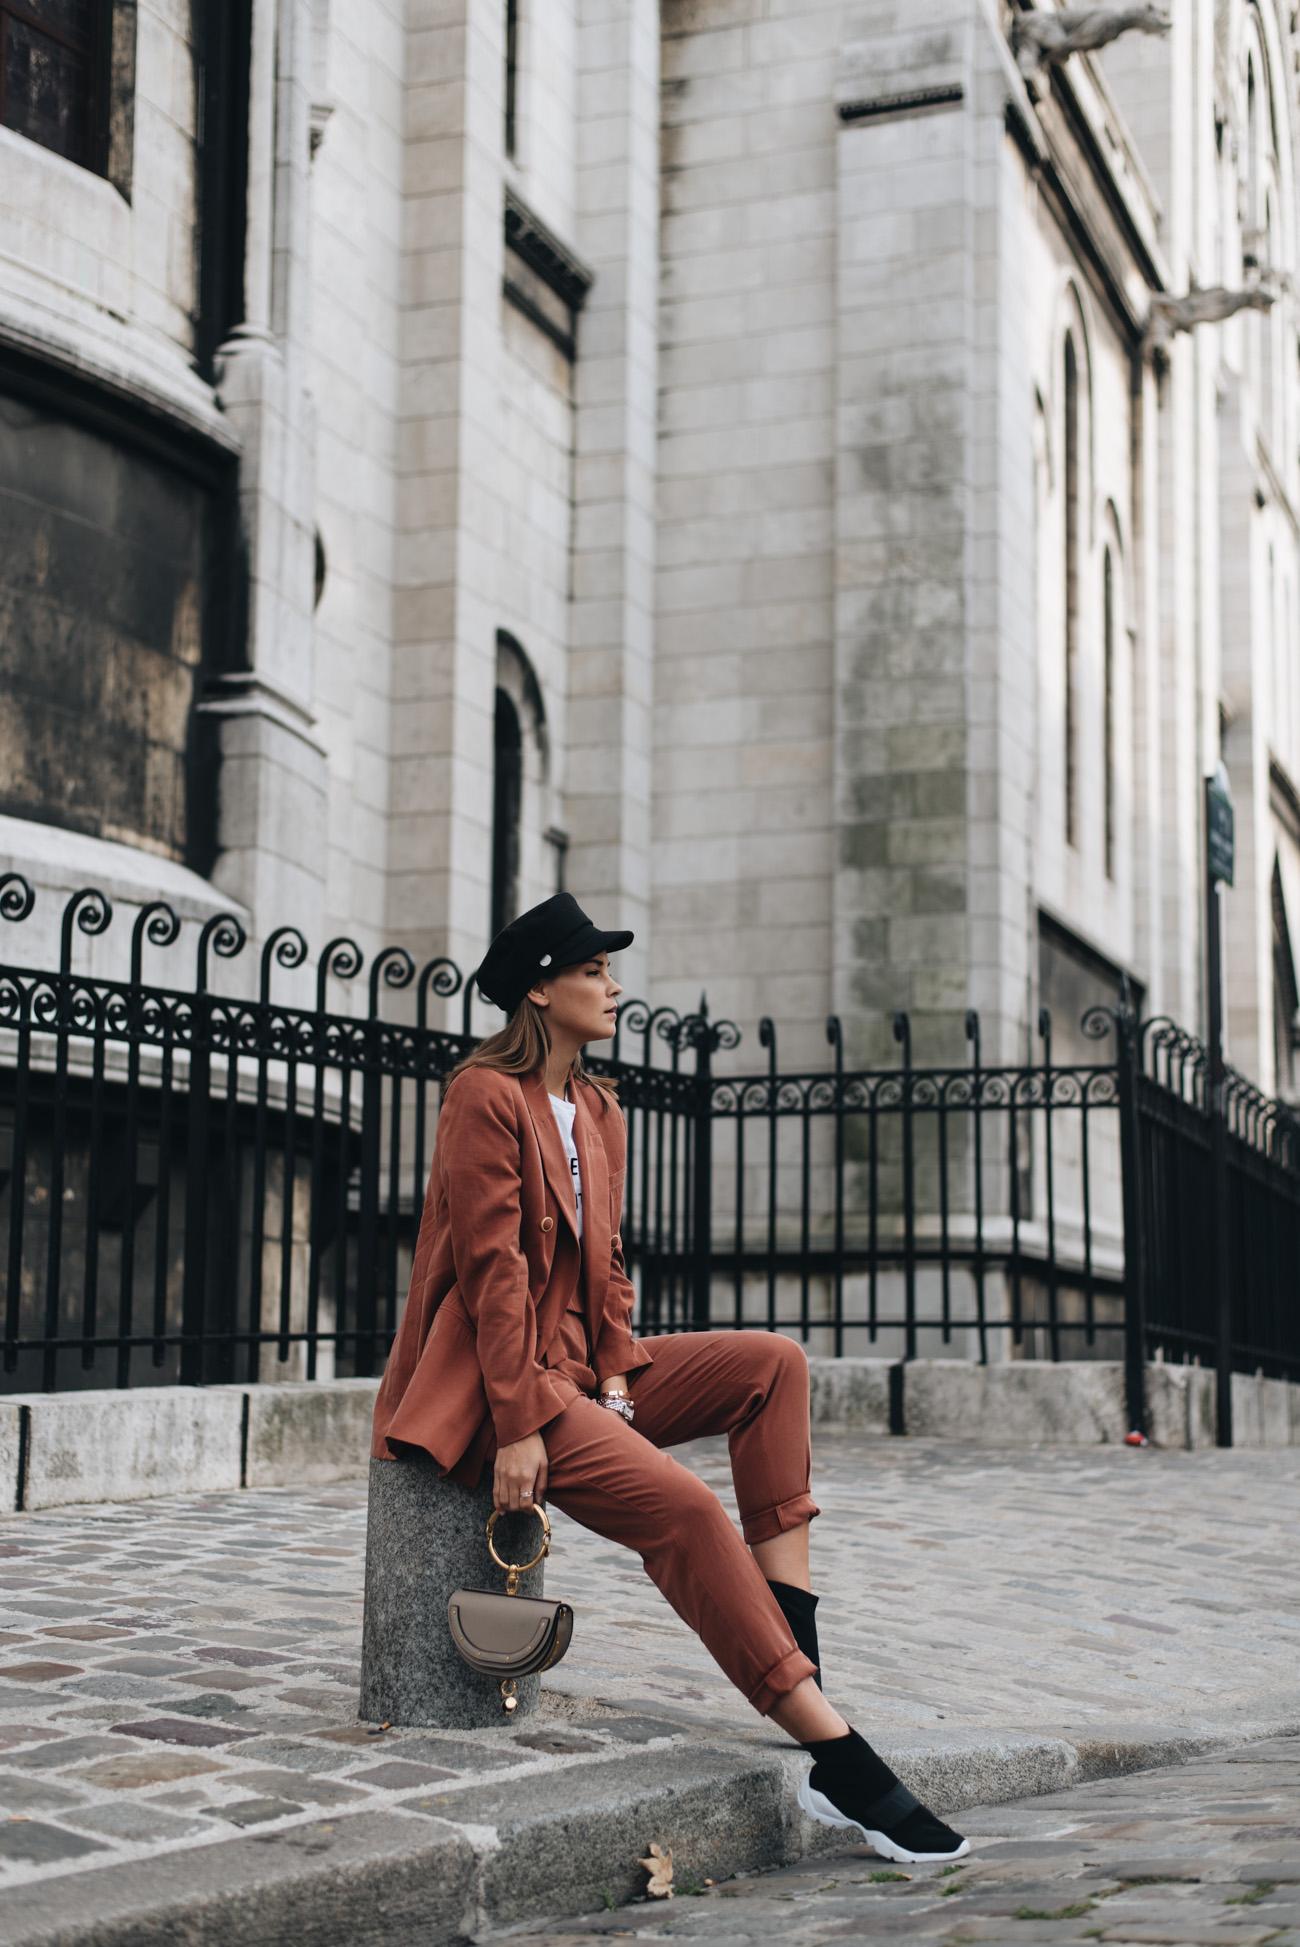 mode-trend-hosenanzug-zweiteiler-rostbraun-oversize-blazer-stoff-hose-mango-baker-boy-hut-socken-sneaker-balenciaga-look-alike-chloé-nile-nina-schwichtenberg-fashiioncarpet